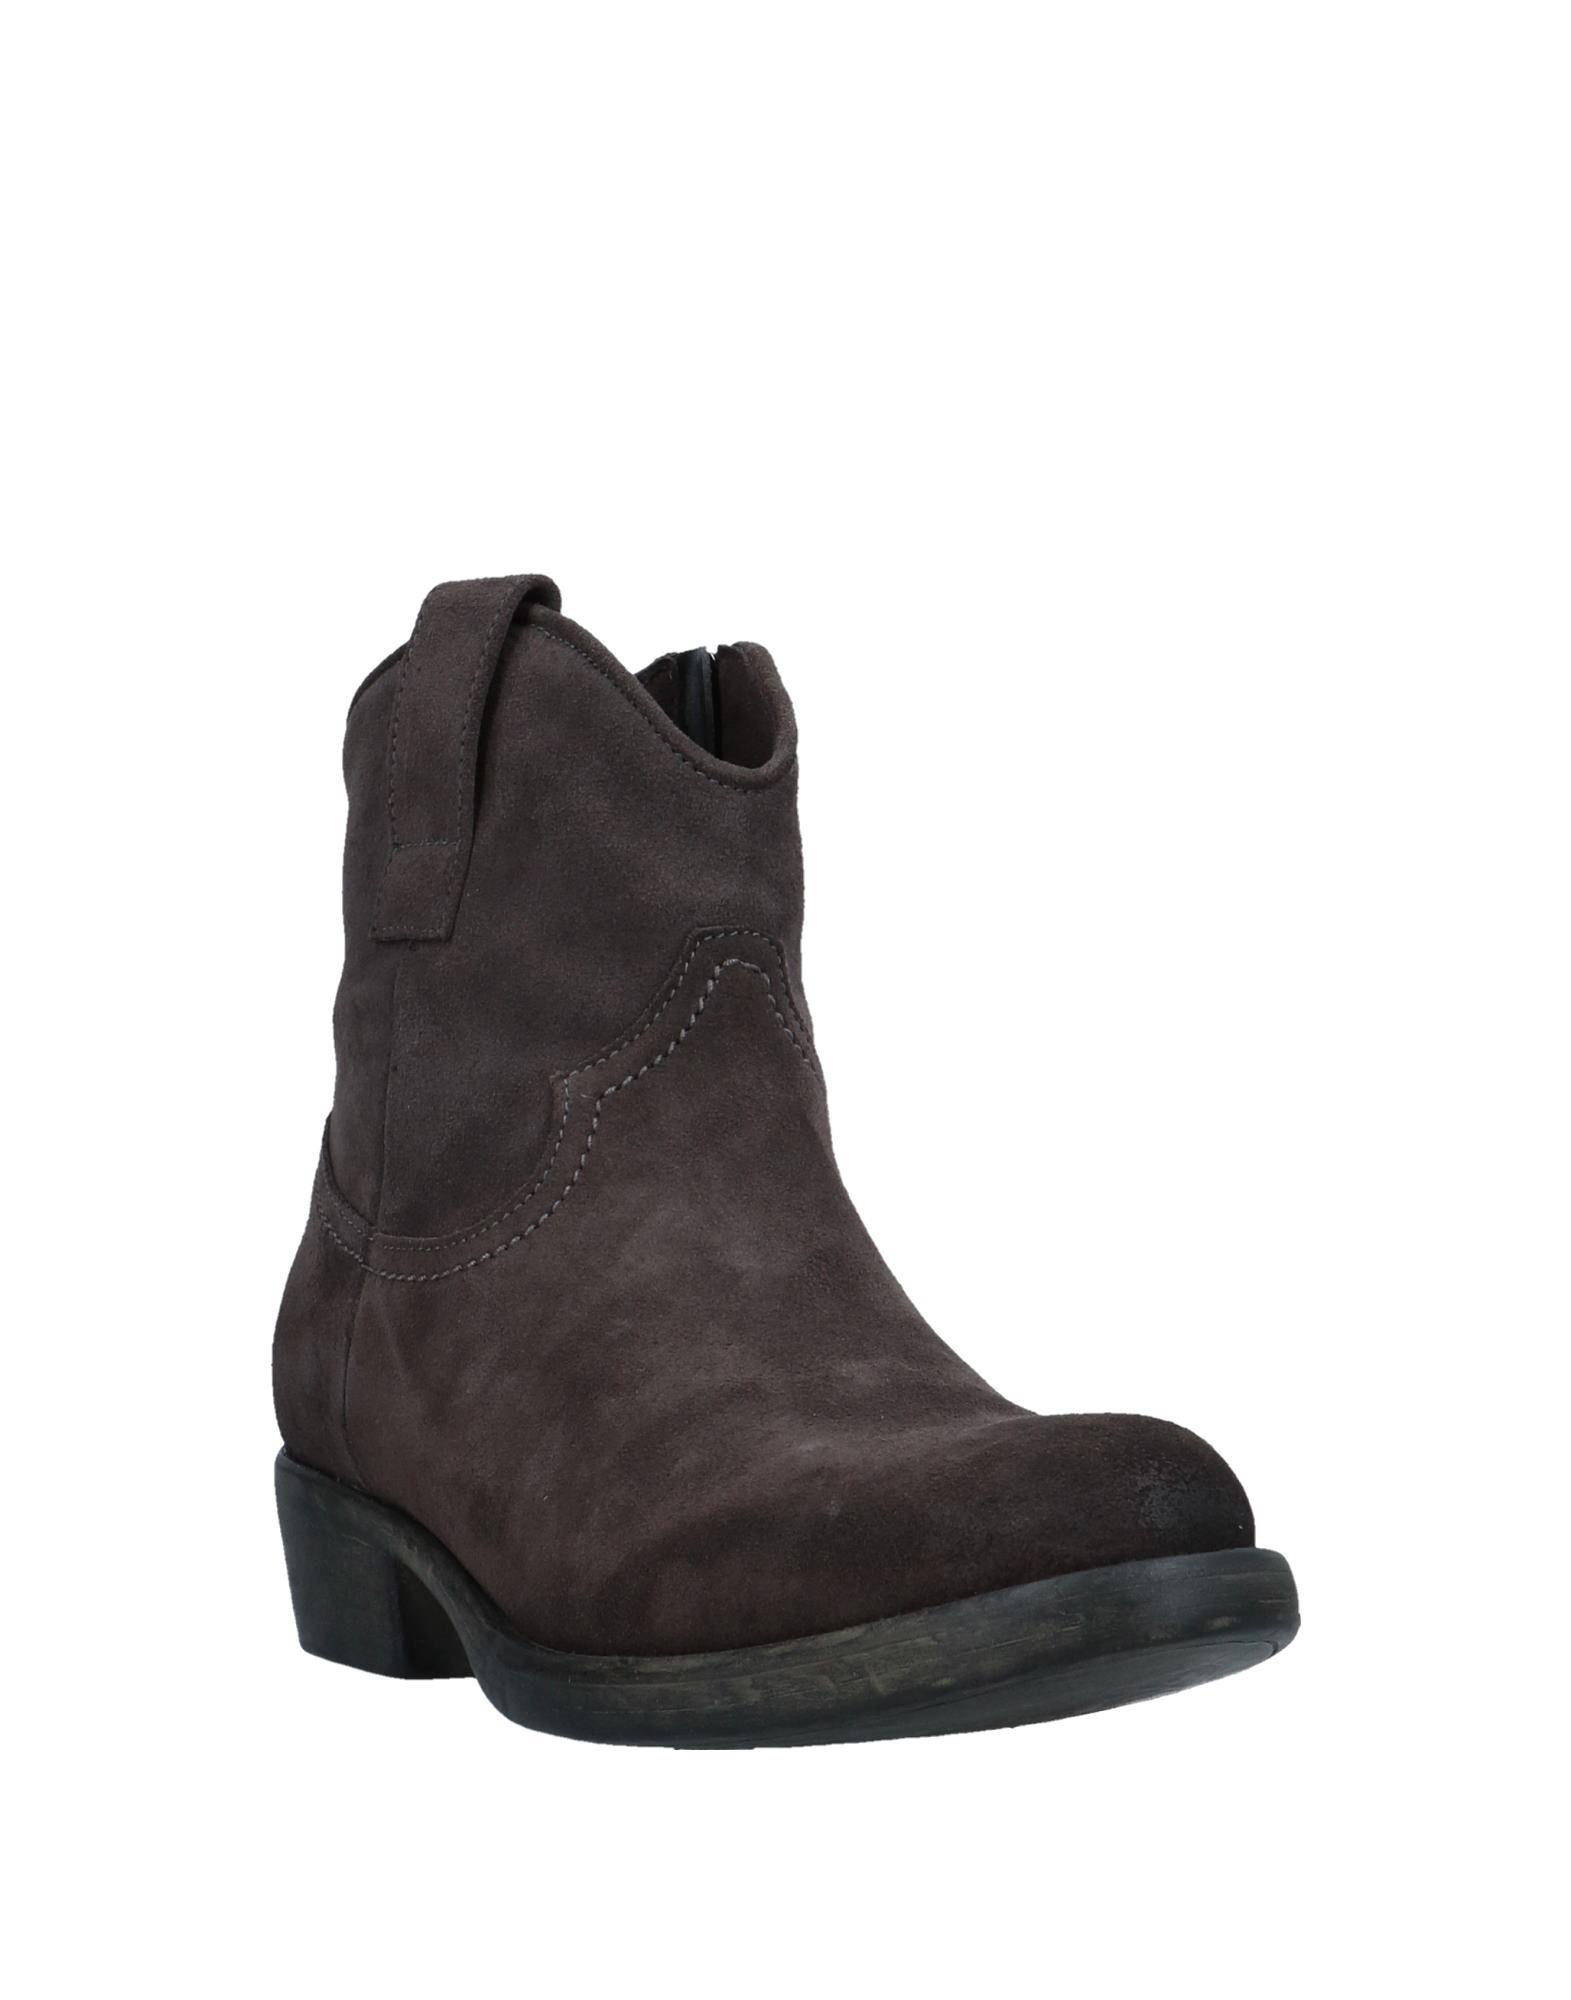 Maria Cristina Stiefelette Damen strapazierfähige  11520826FTGut aussehende strapazierfähige Damen Schuhe 5065c8